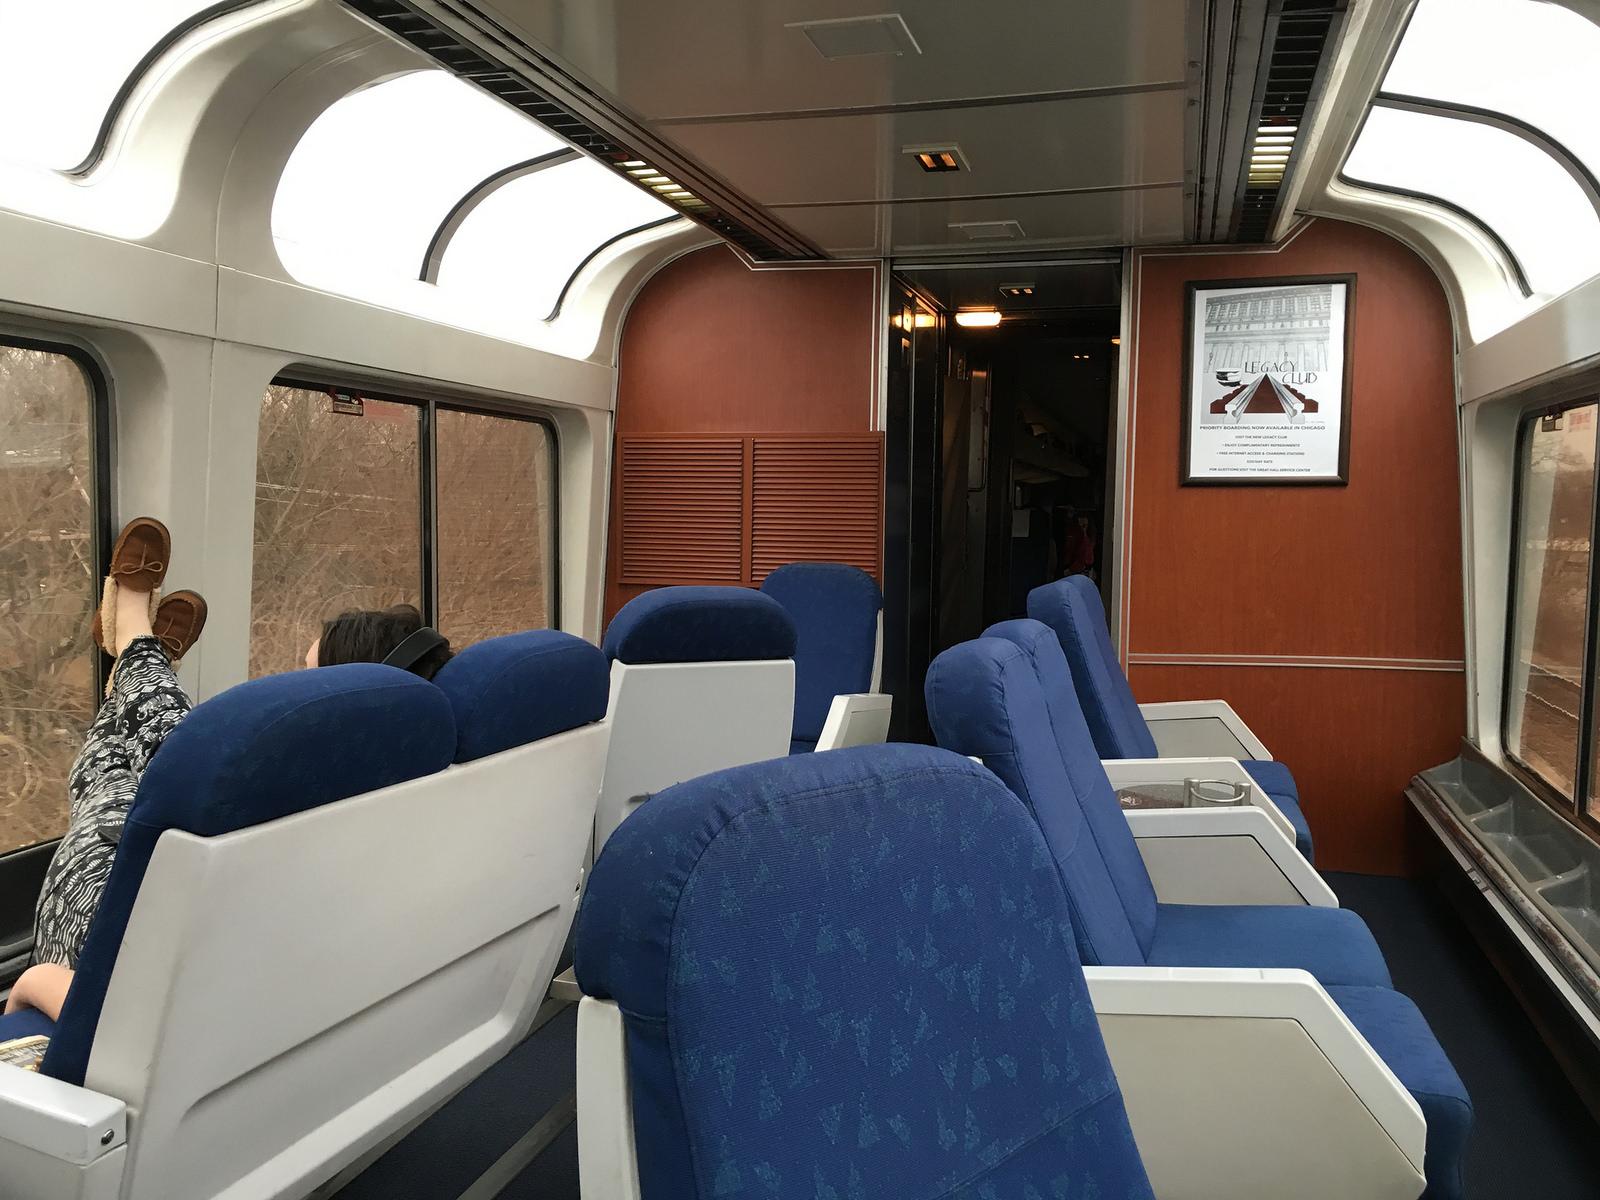 Amtrak Sightseeing Car